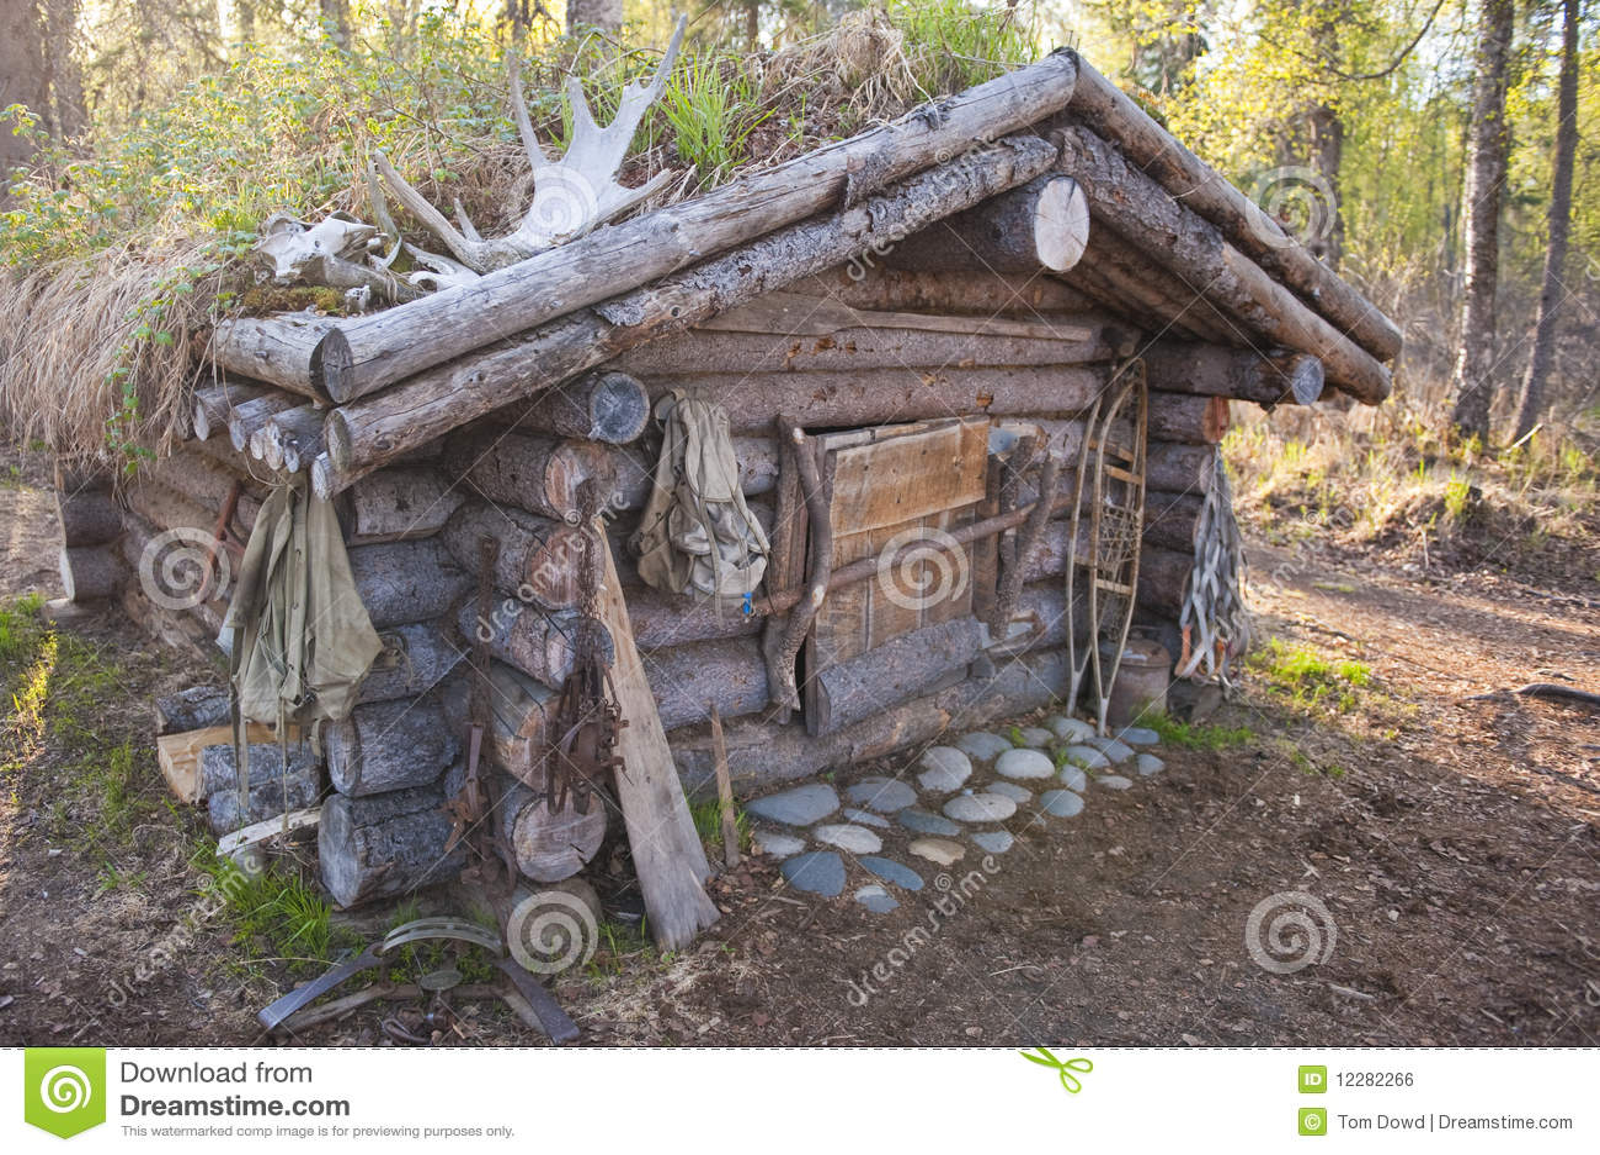 hunting lodge business plan